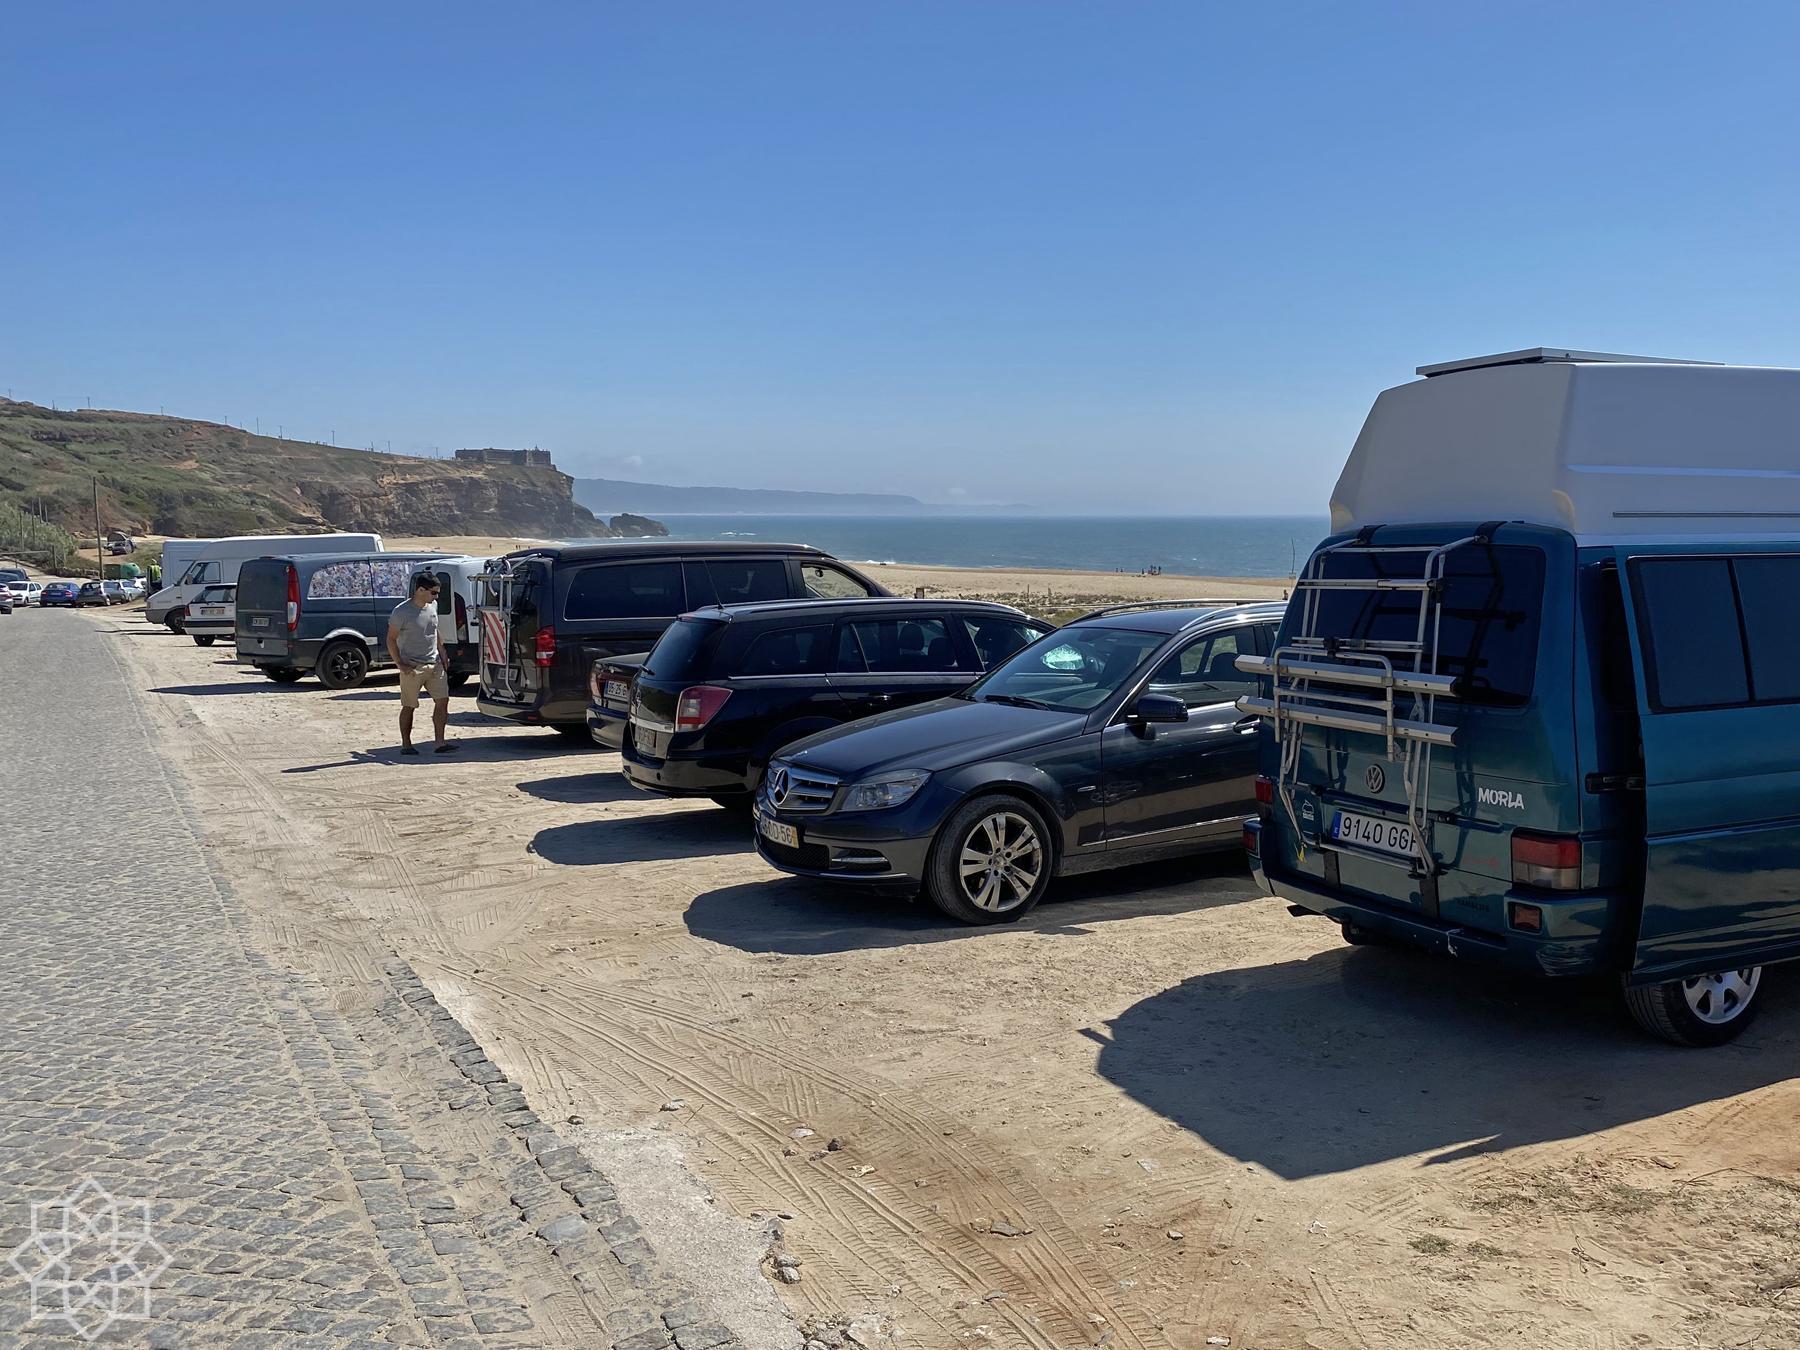 Praia do Norte August 2020